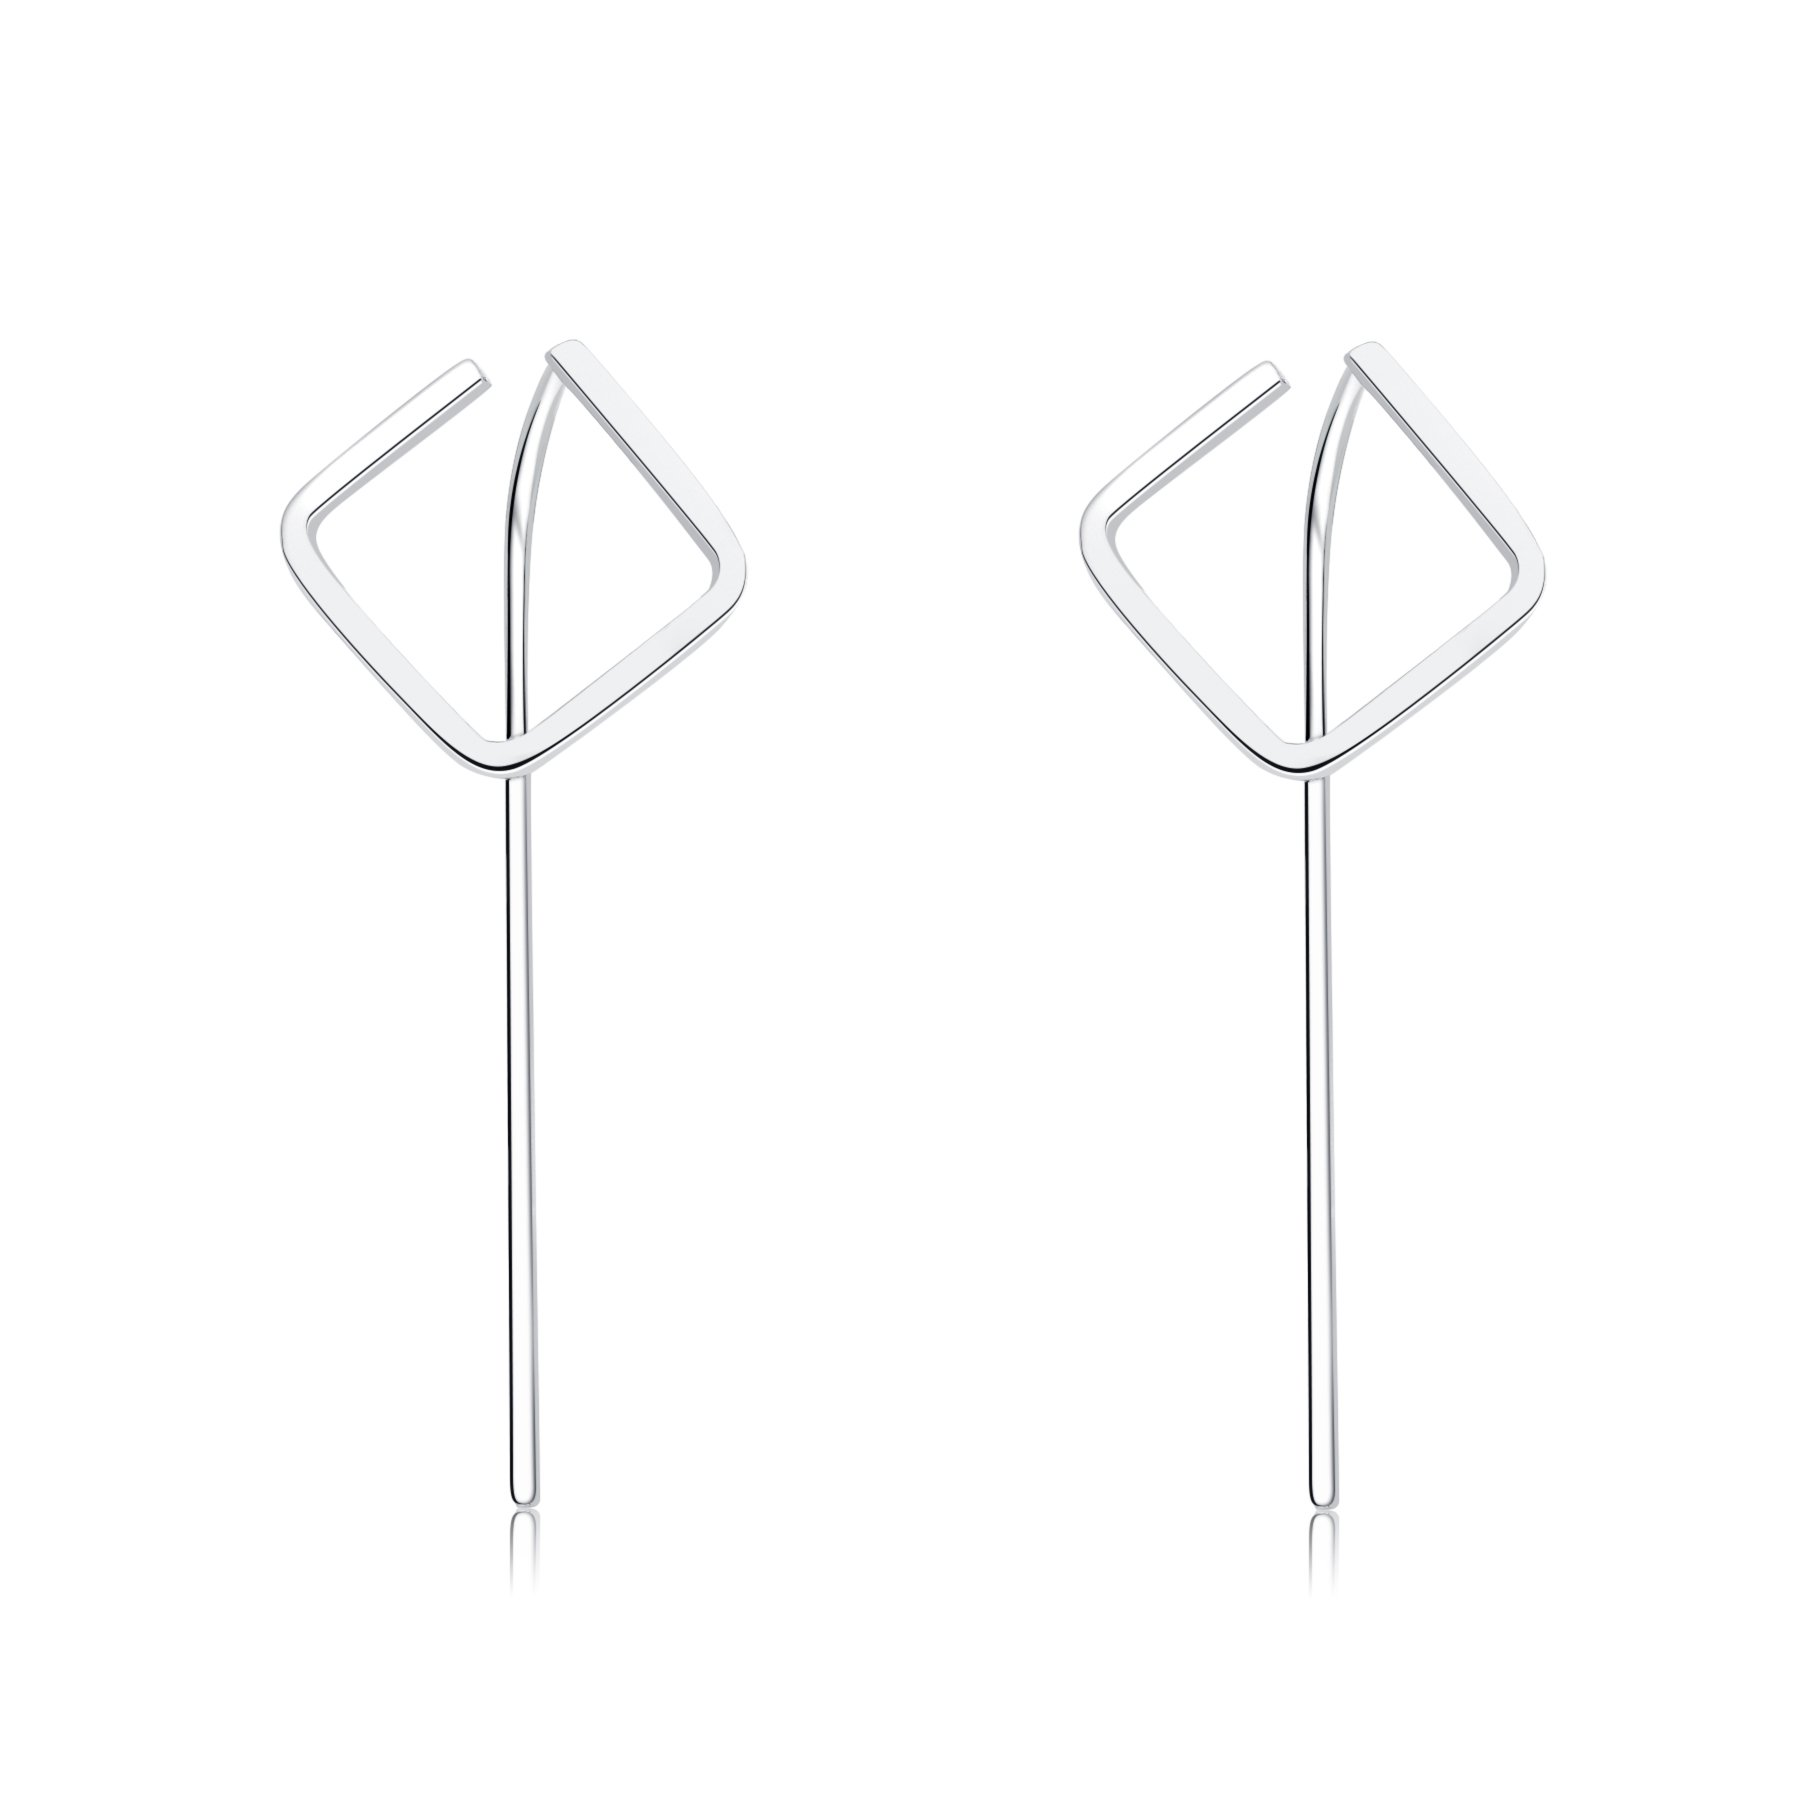 Bigbabybig 925 Sterling Silver JewelrySquare Hoop Earrings for Women Girls